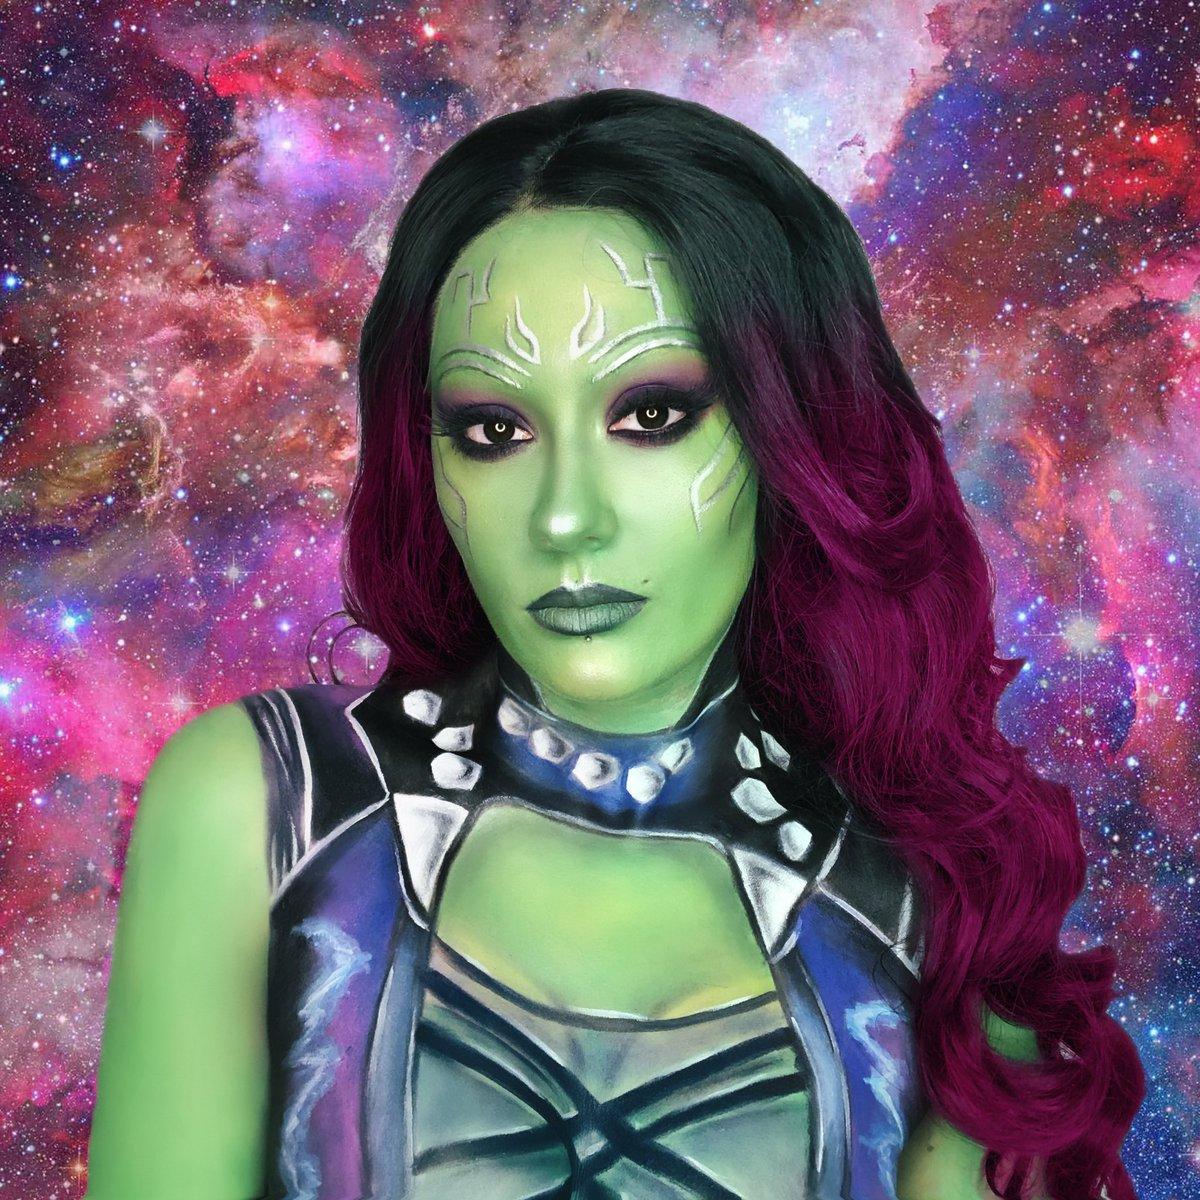 « You said it yourself bitch, we are the Guardians of the Galaxy. » - Star Lord. 🛸 #gamora #marvel #makeup #bodypaint #makeupartist #GuardiansoftheGalaxy #GOTG #MarvelsAvengers #avengers #nebula #groot @MarvelFR @Marvel @Guardians @DisneylandParis @DisneyPlusFR @DisneyFR